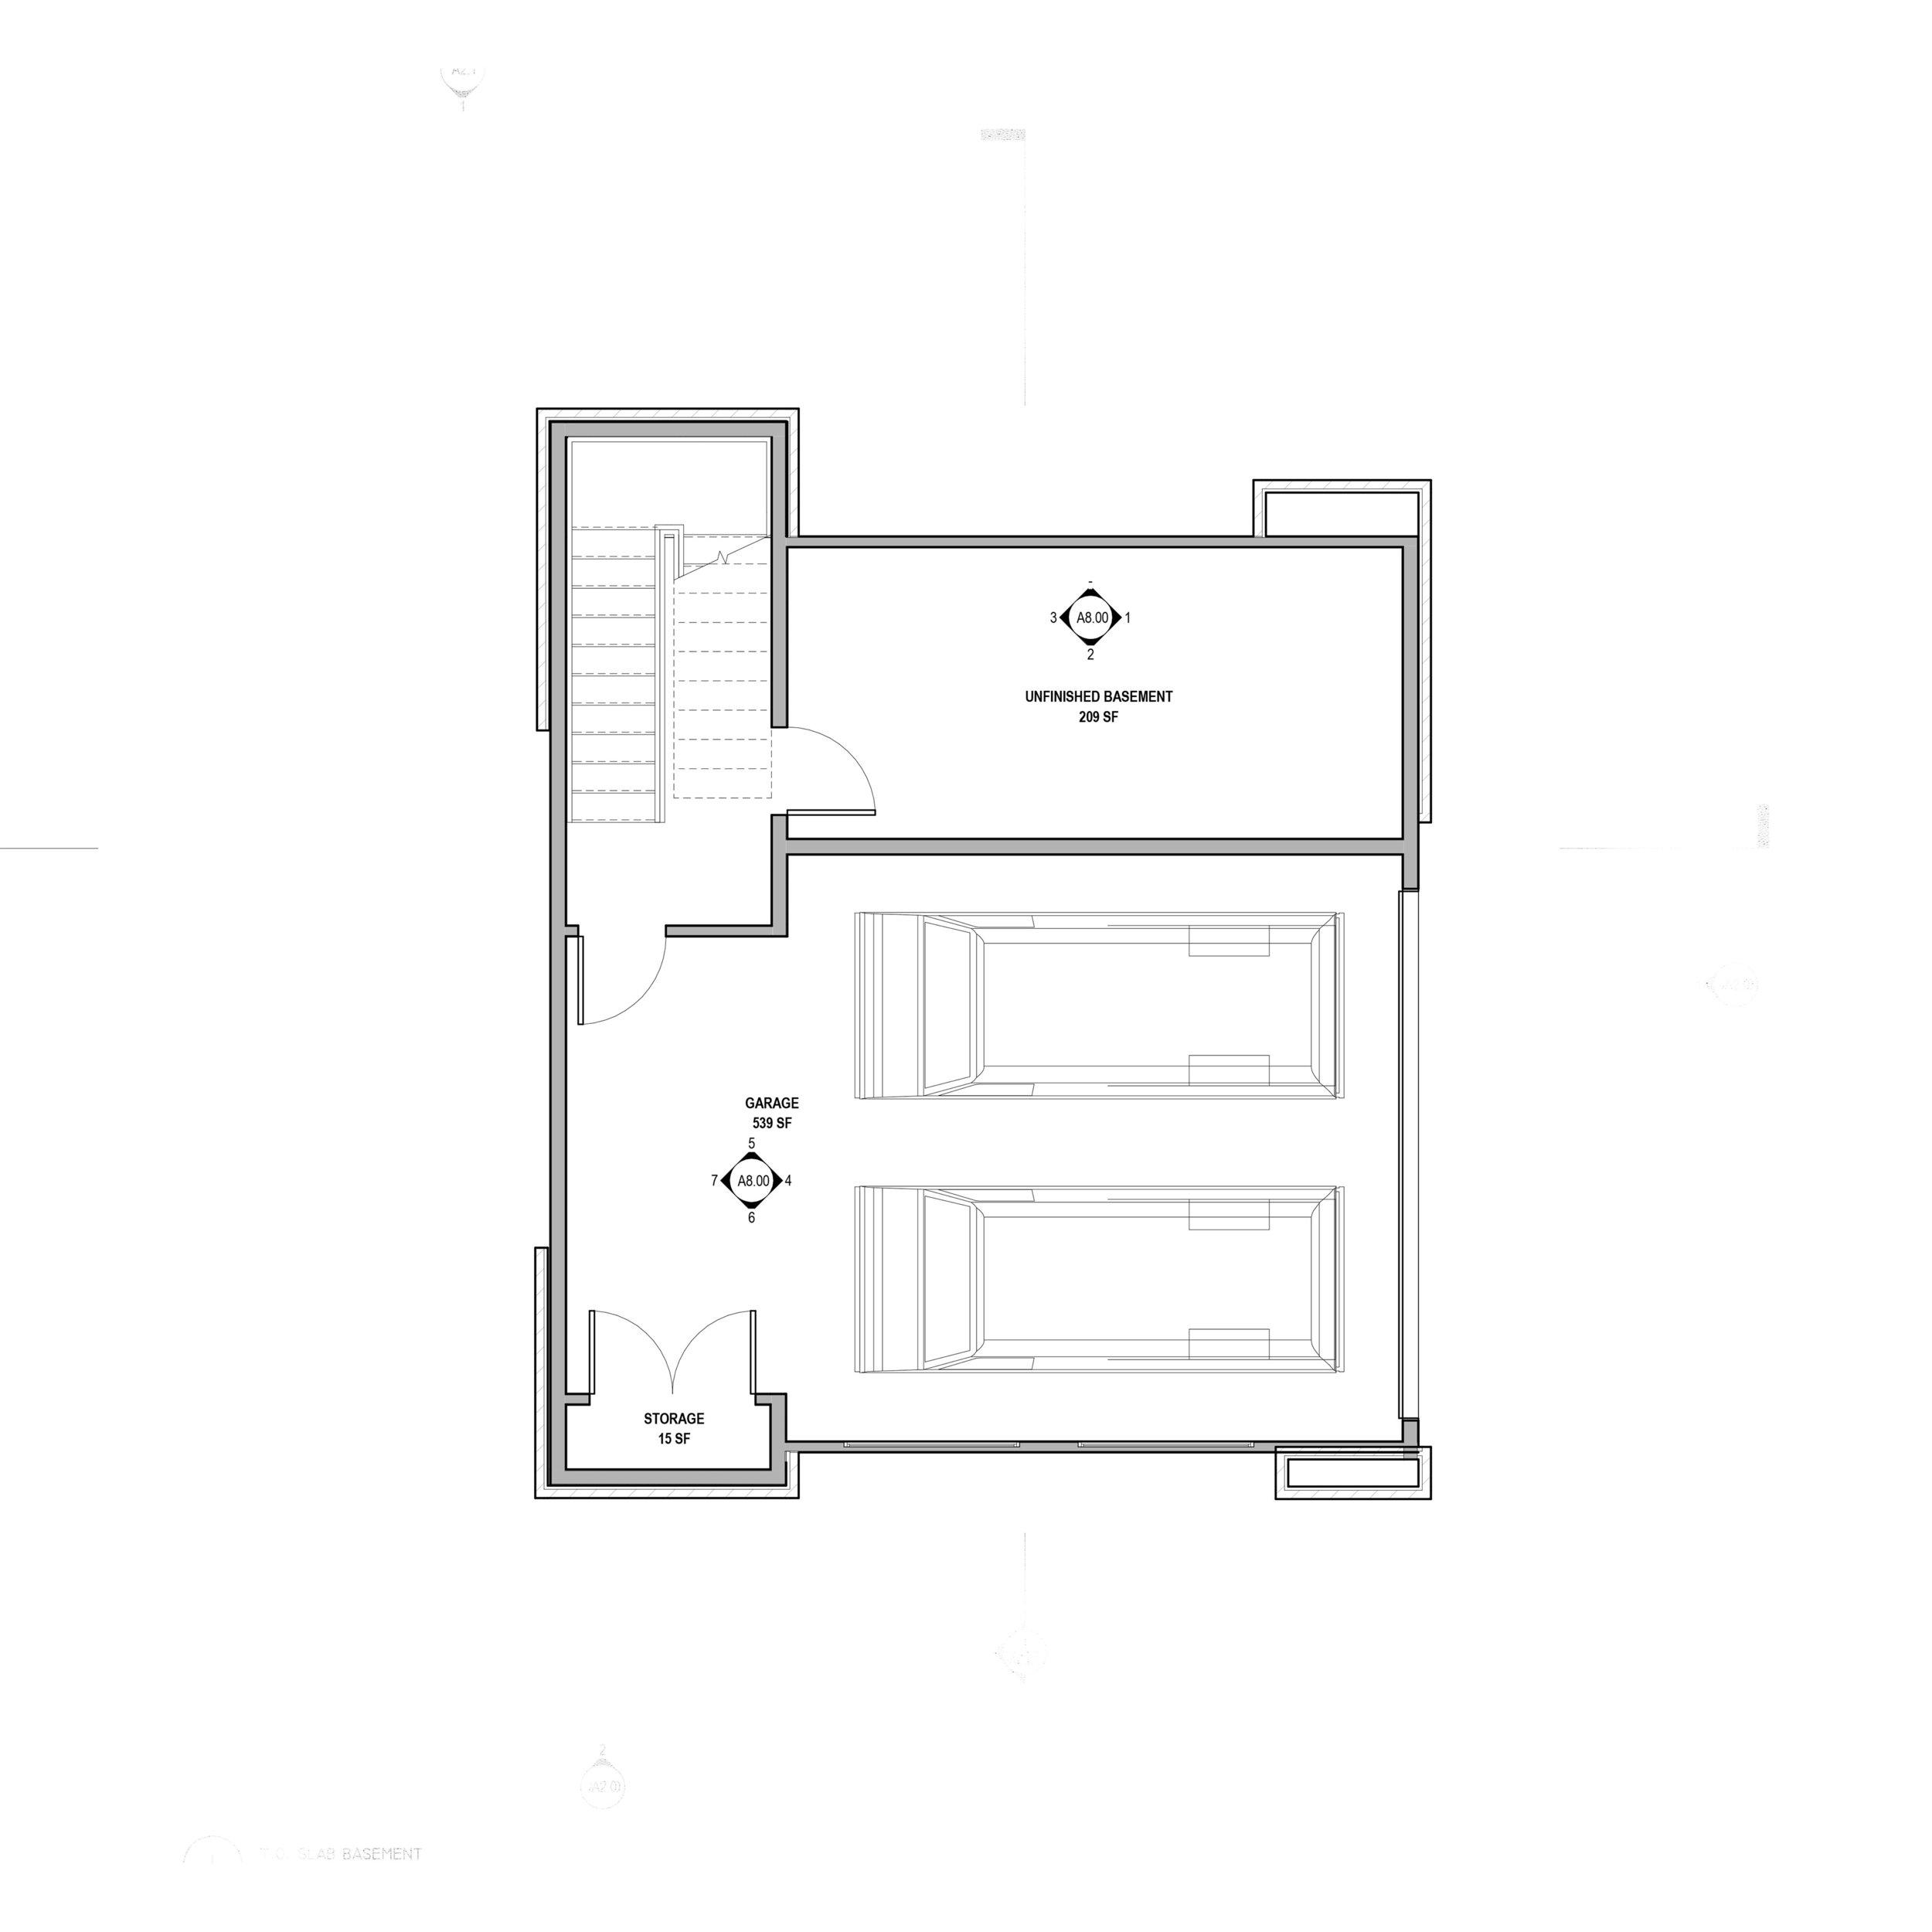 Copy of Garage & Basement 9